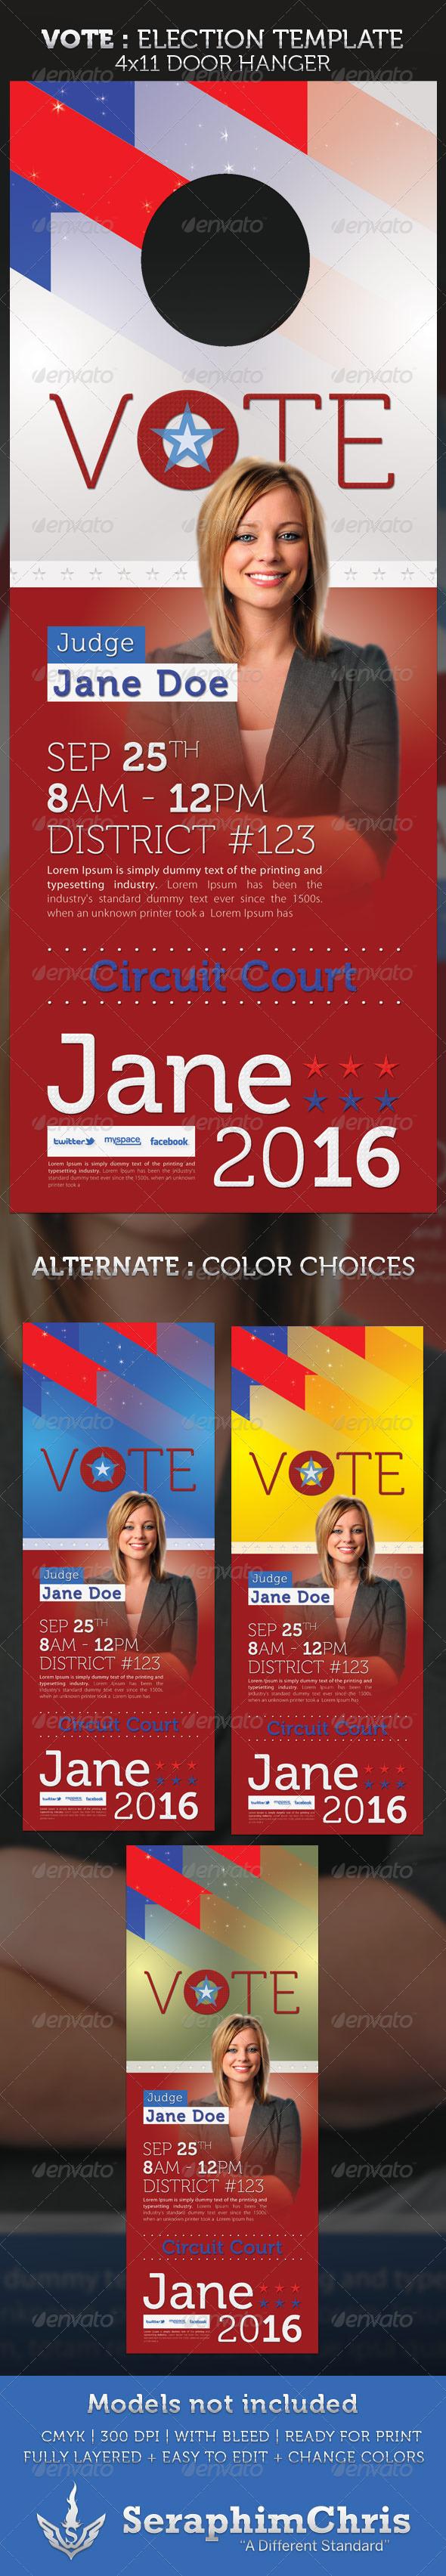 Vote poster template for microsoft